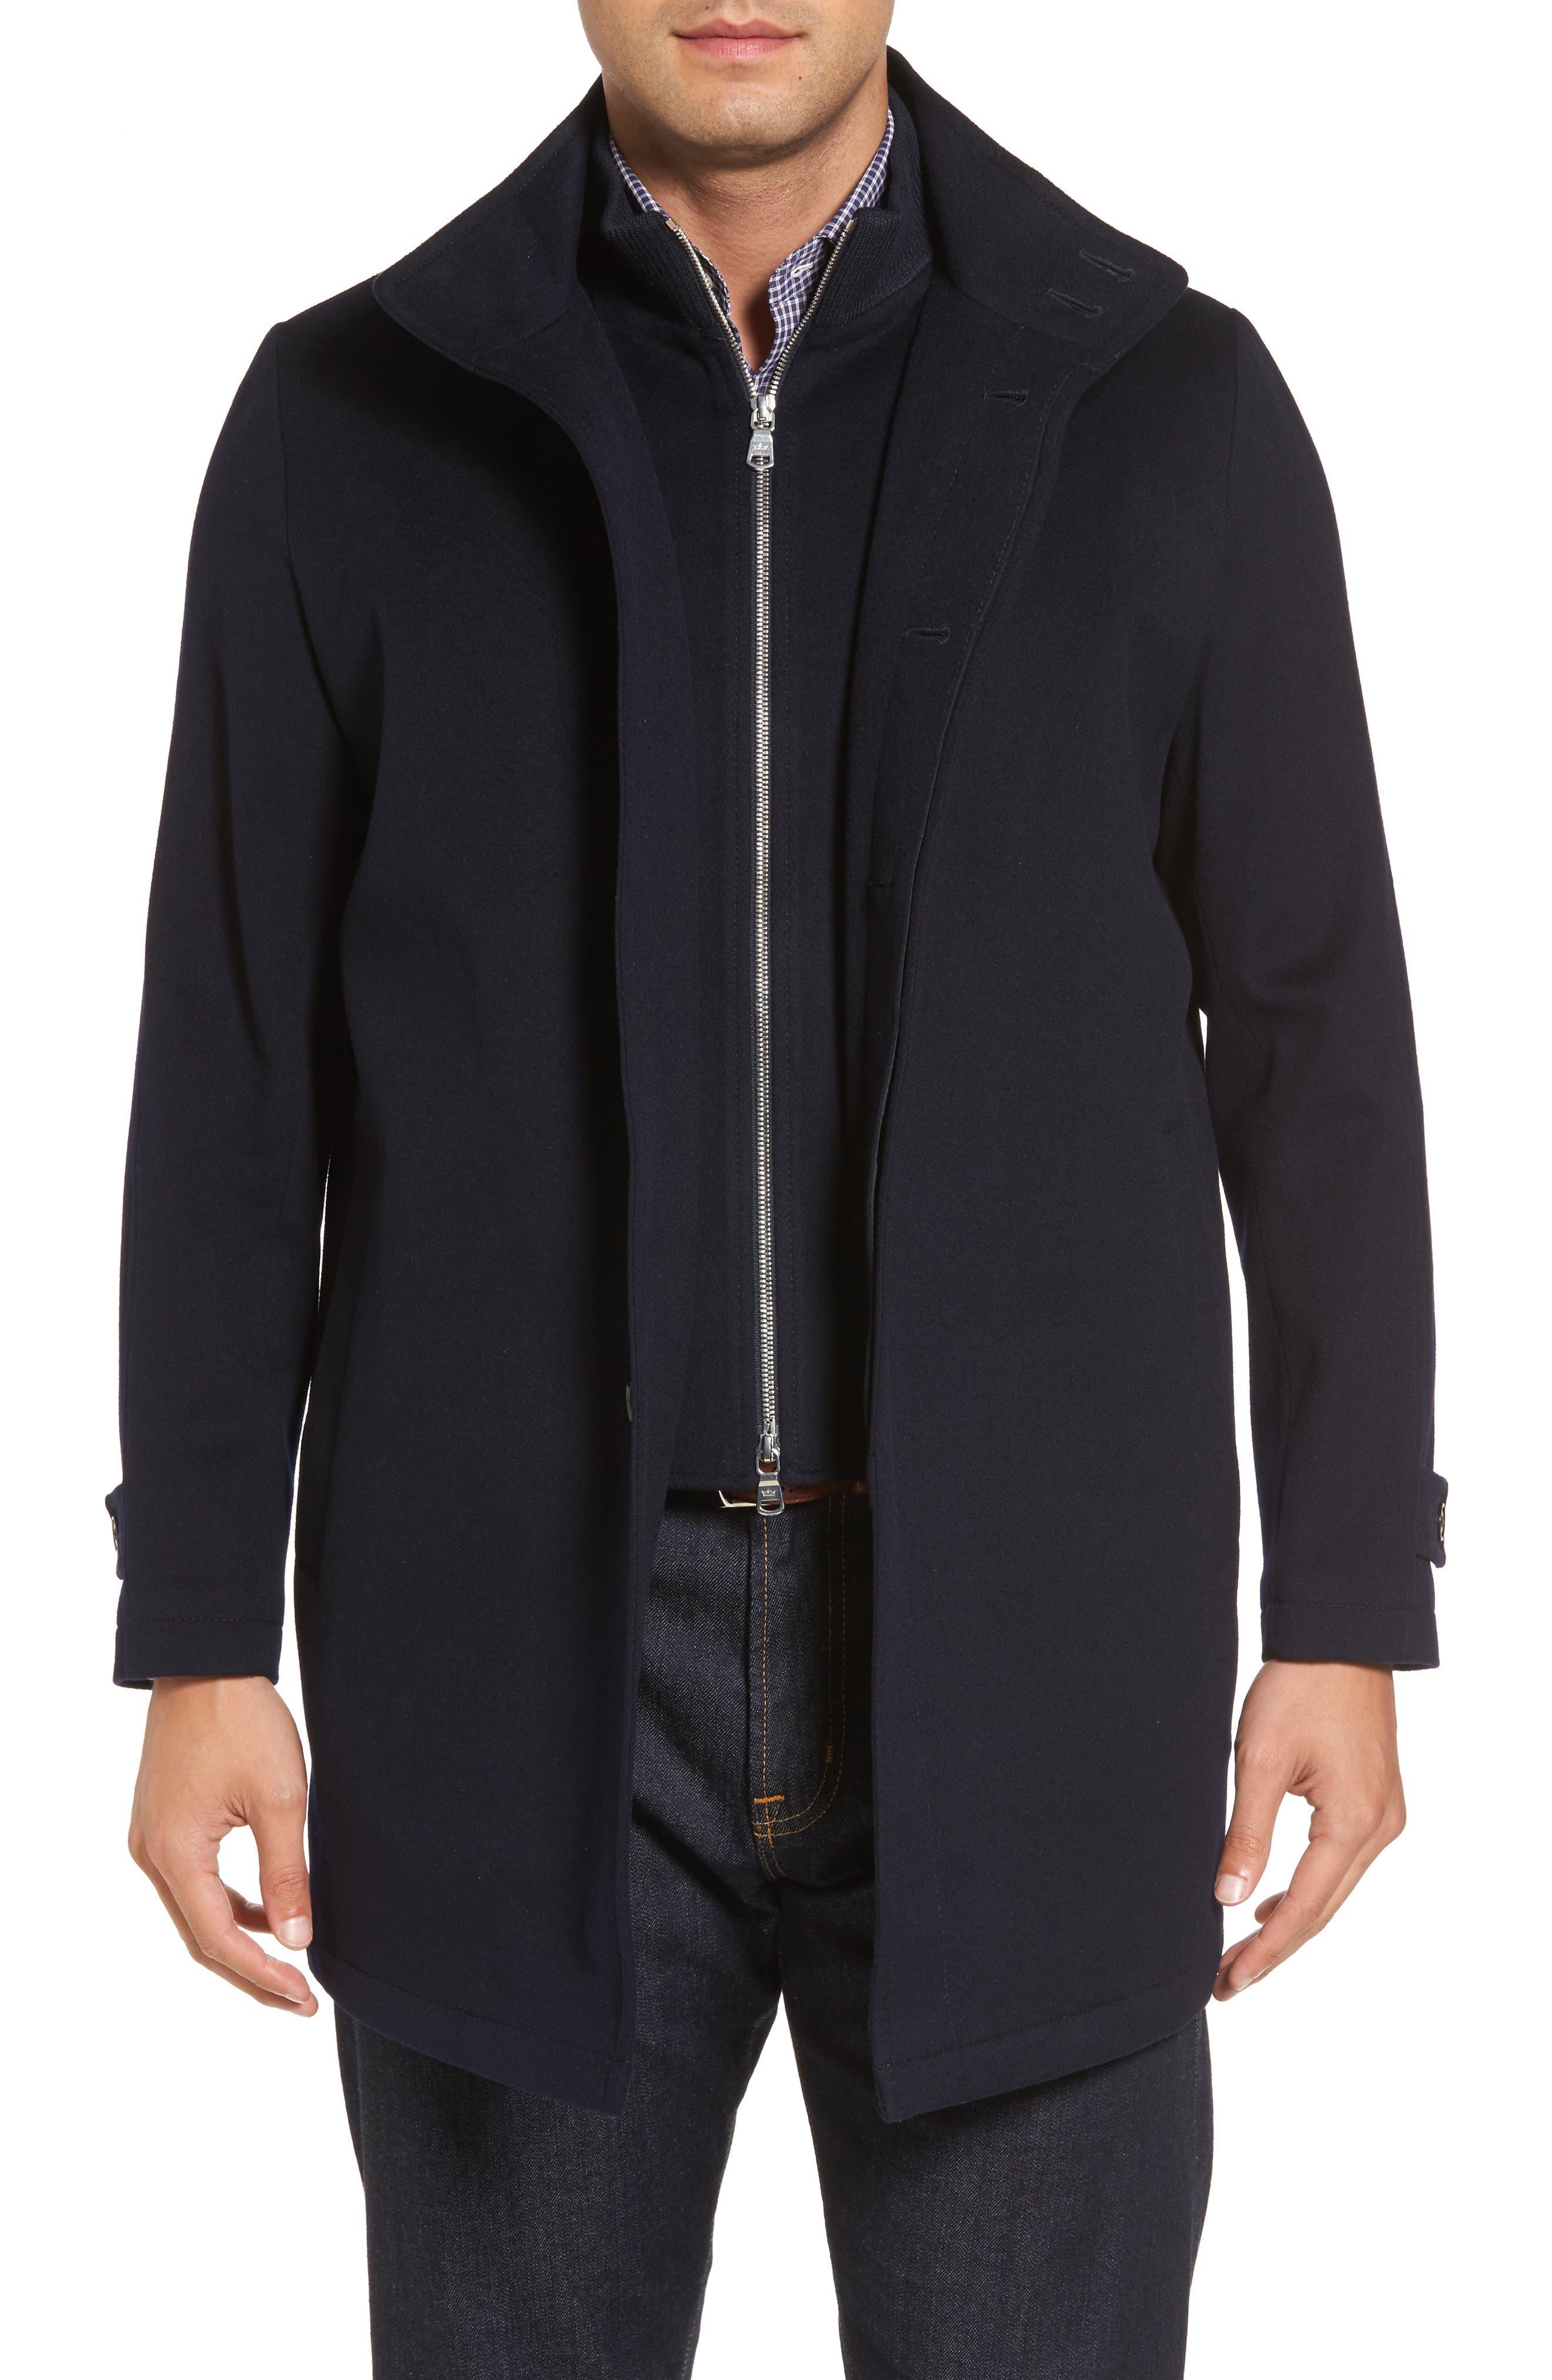 Peter Millar Horizon Wool Overcoat,                             Main thumbnail 1, color,                             Black